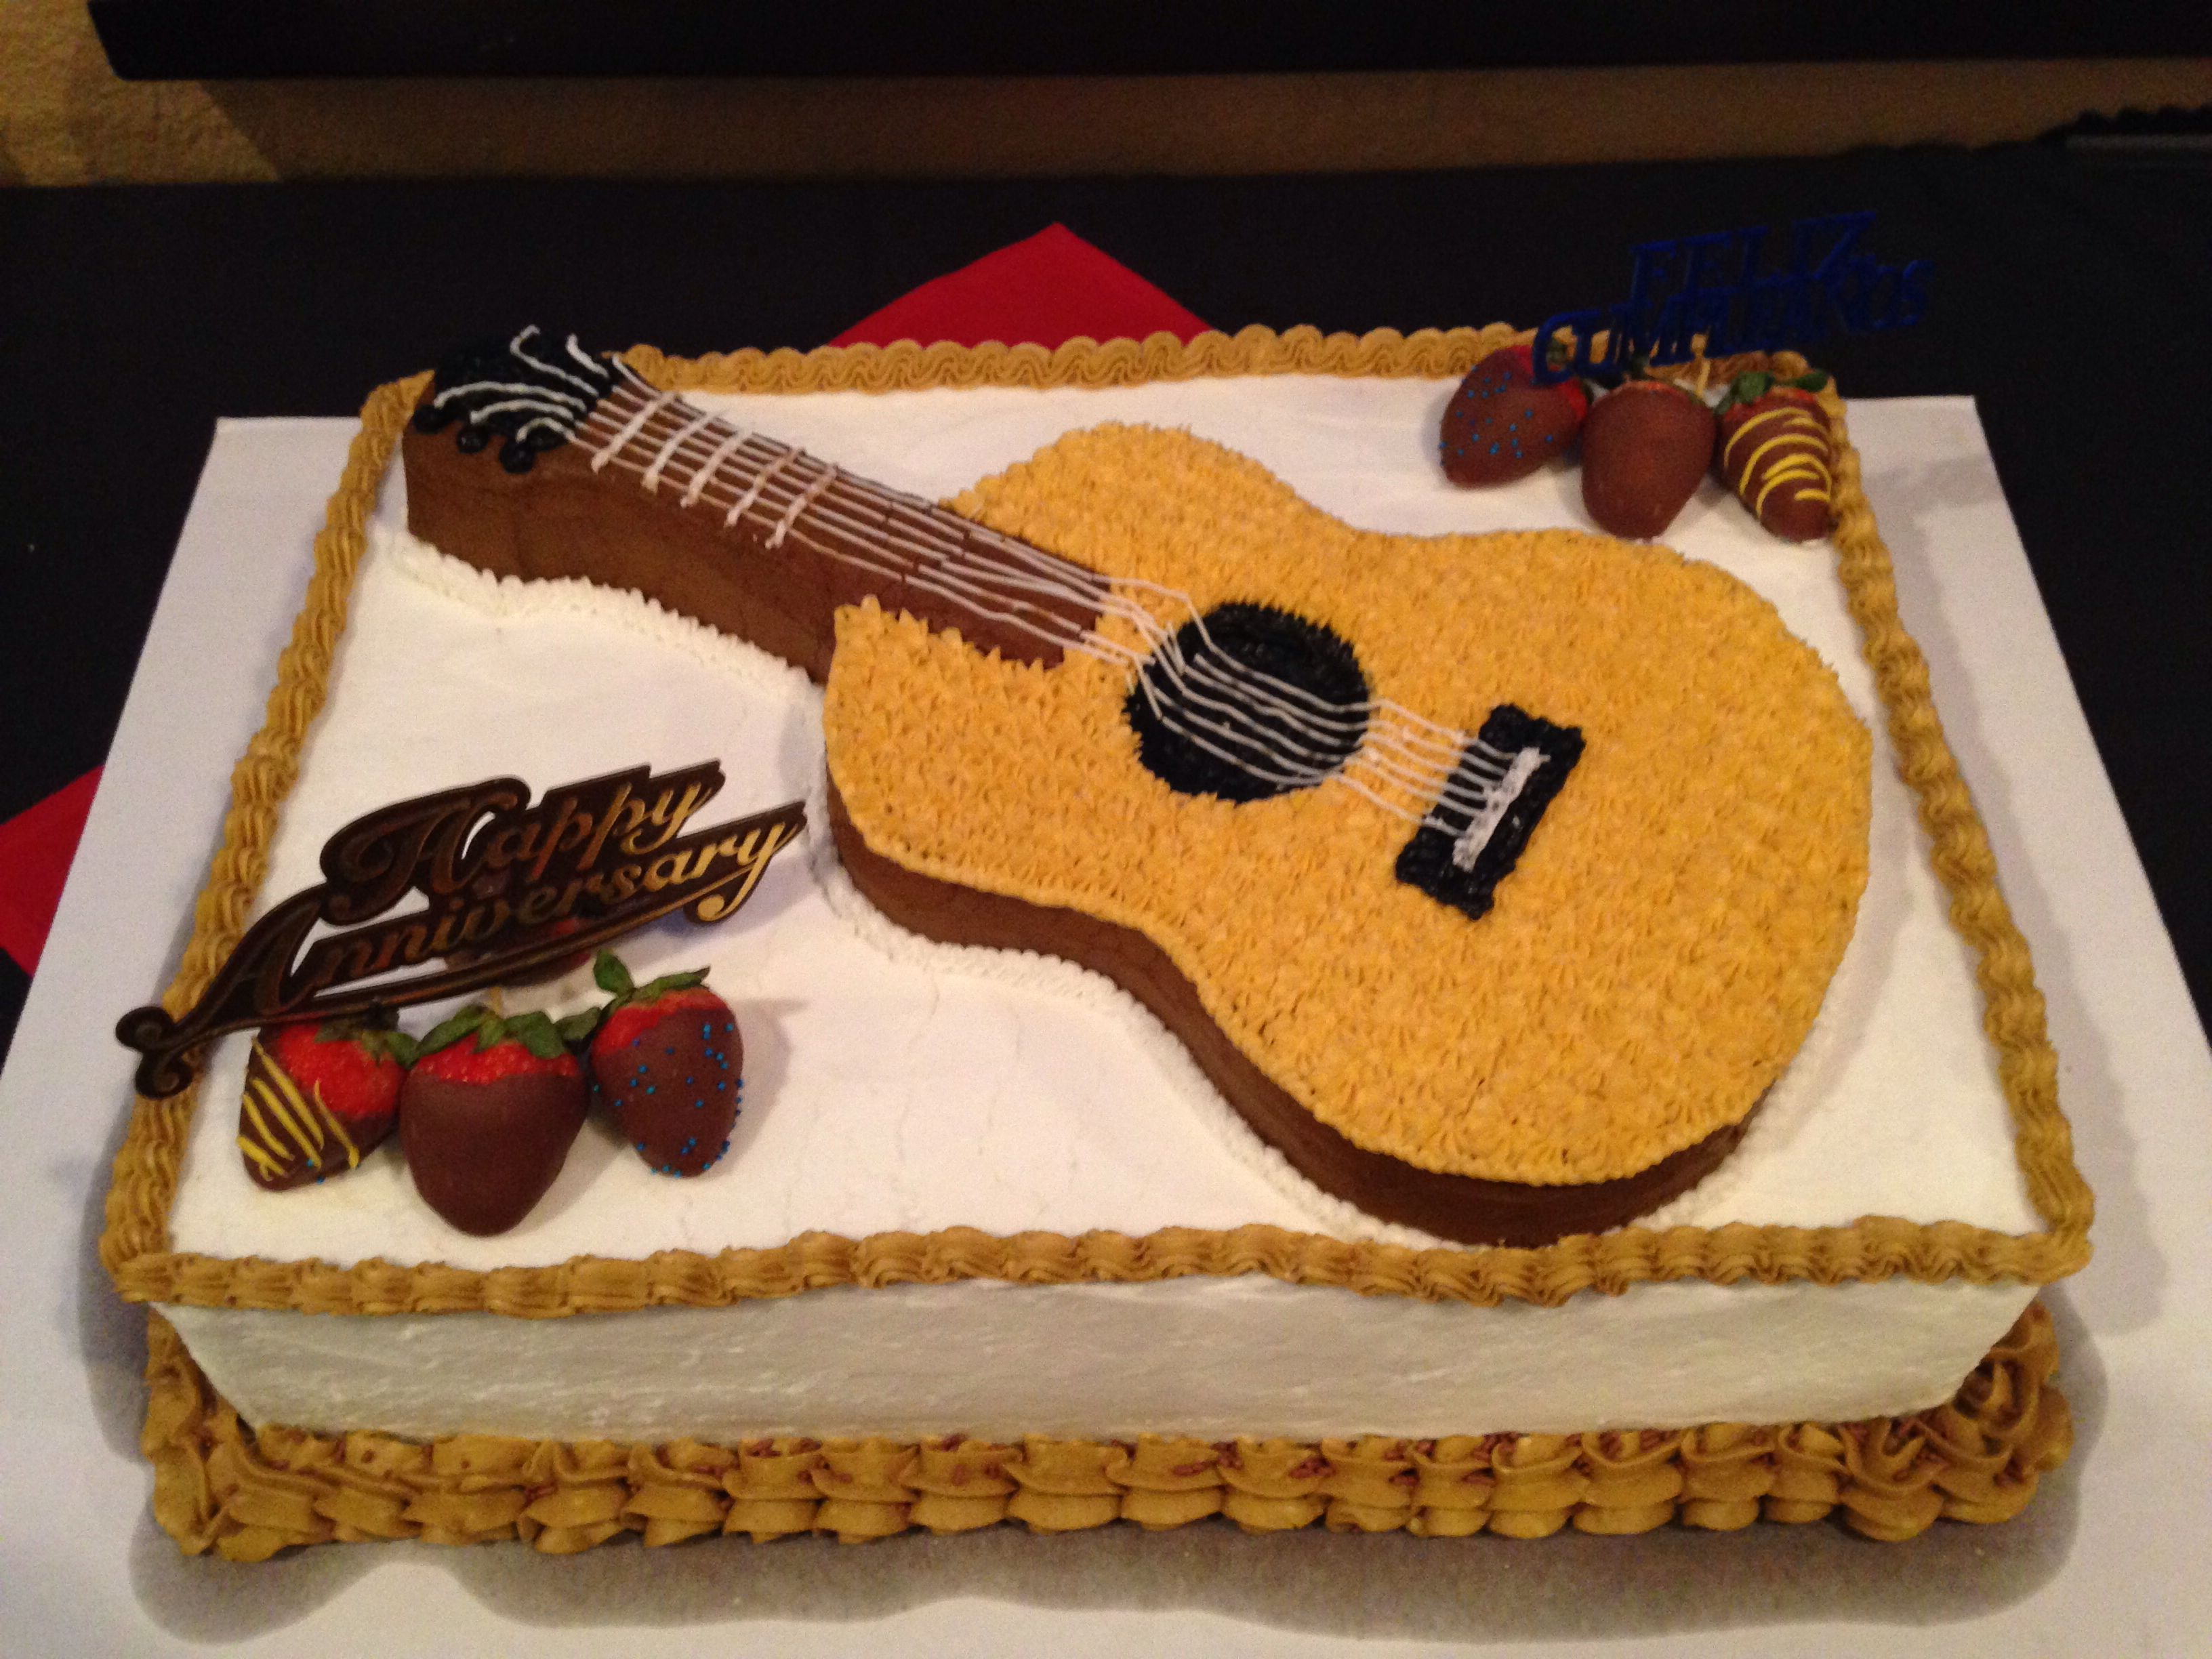 торт гитара из мастики мастер класс фото под ним продукция